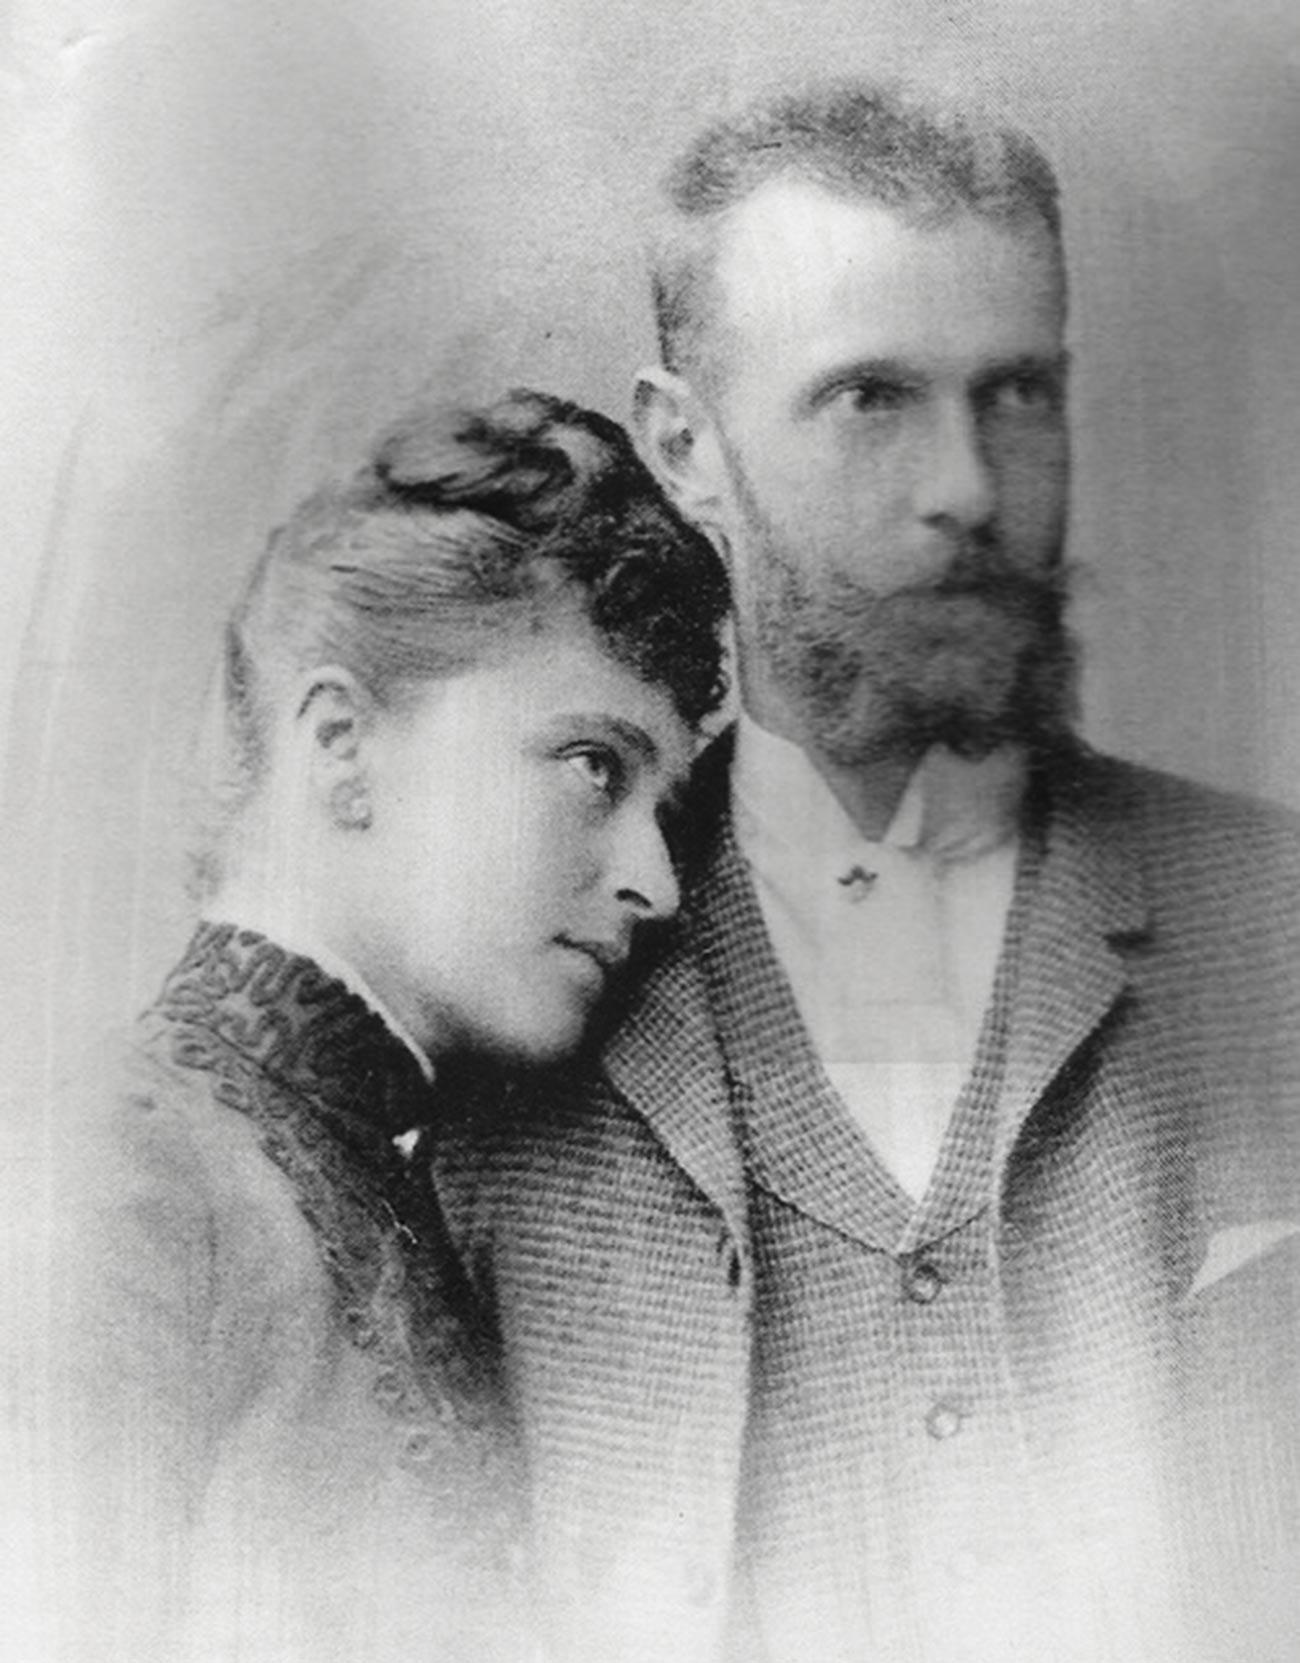 Elizaveta Fedorovna (Ella) and Sergei Alexandrovich